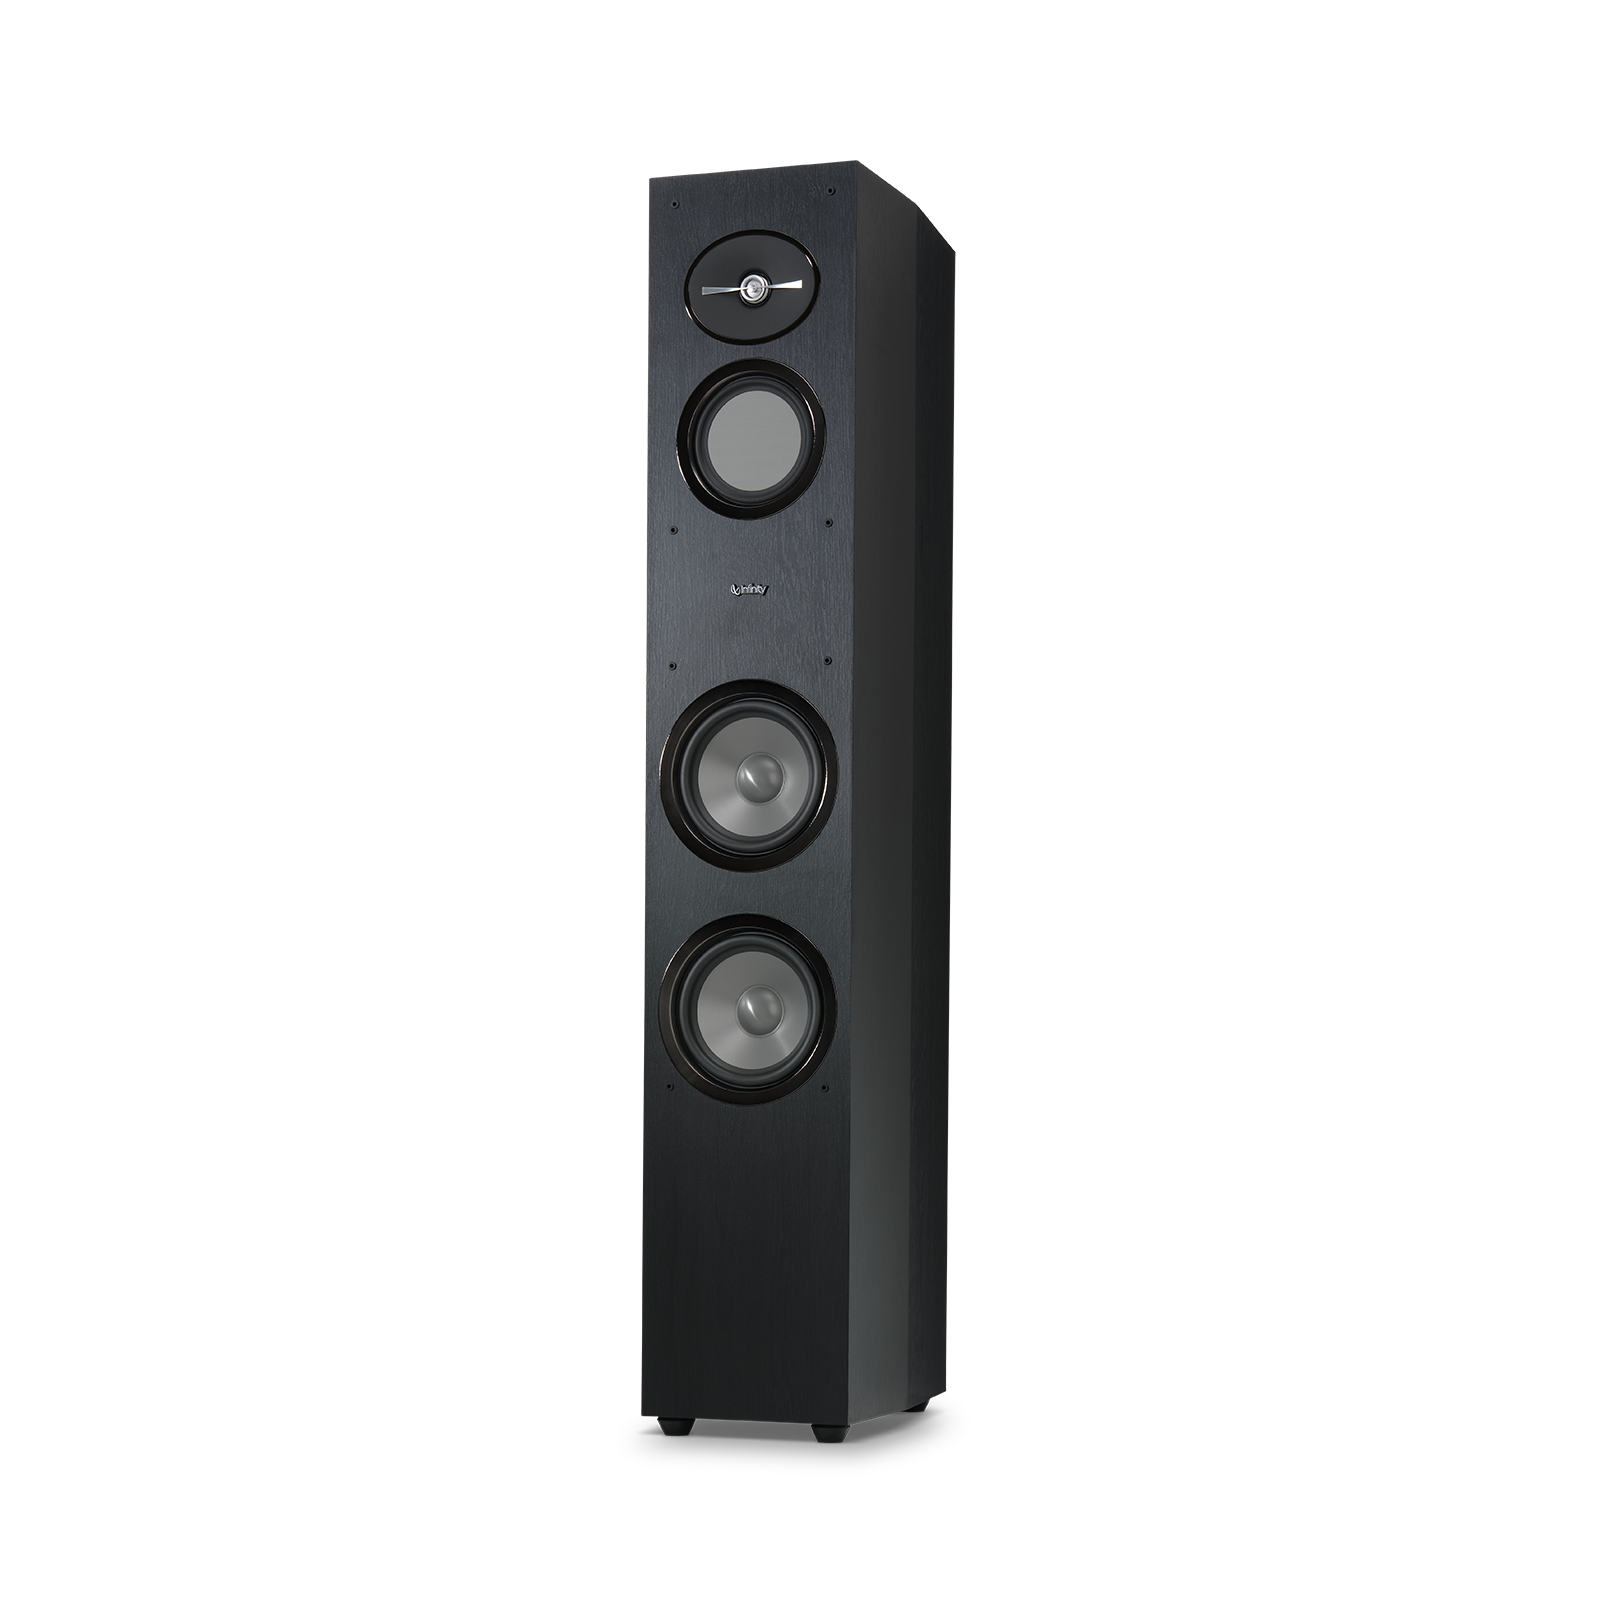 "Reference 263 - Black - 6-1/2"" 3-Way Floorstanding Loudspeaker - Detailshot 1"